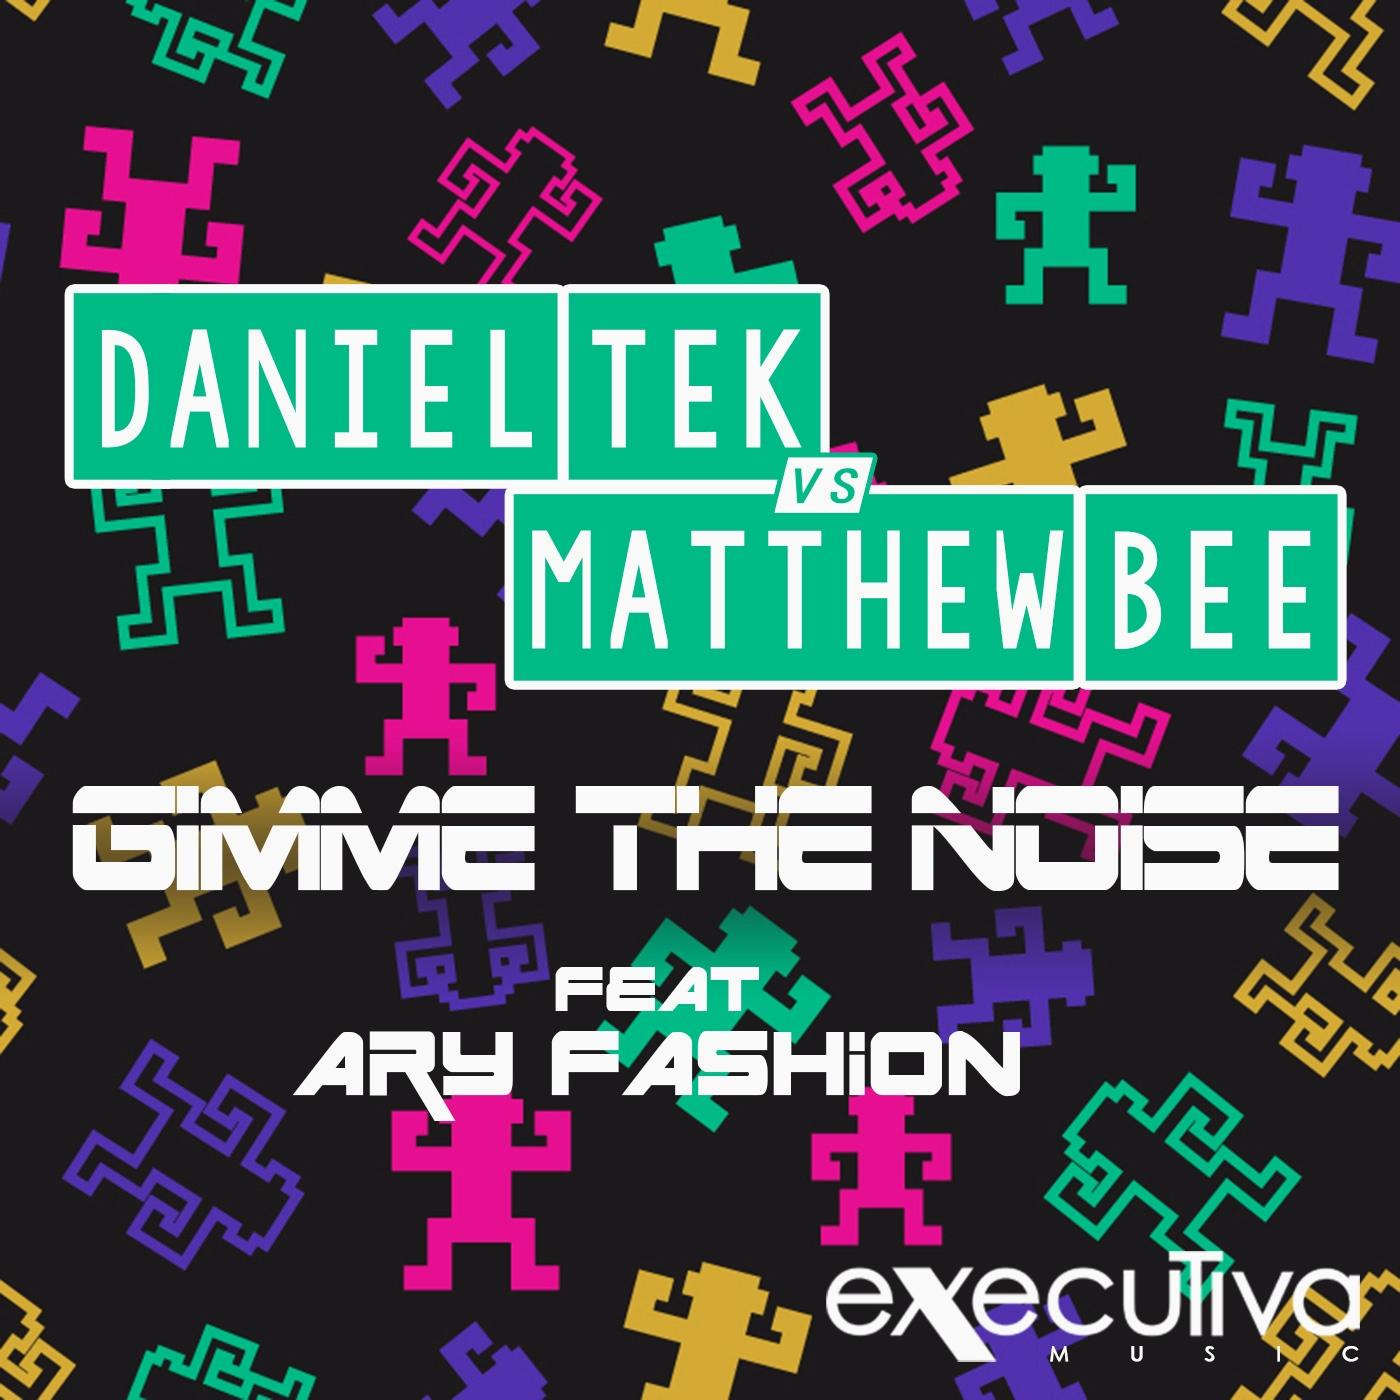 Daniel Tek & Matthew Bee - Gimme The Noise Feat. AryFashion (Alien Cut Remix)